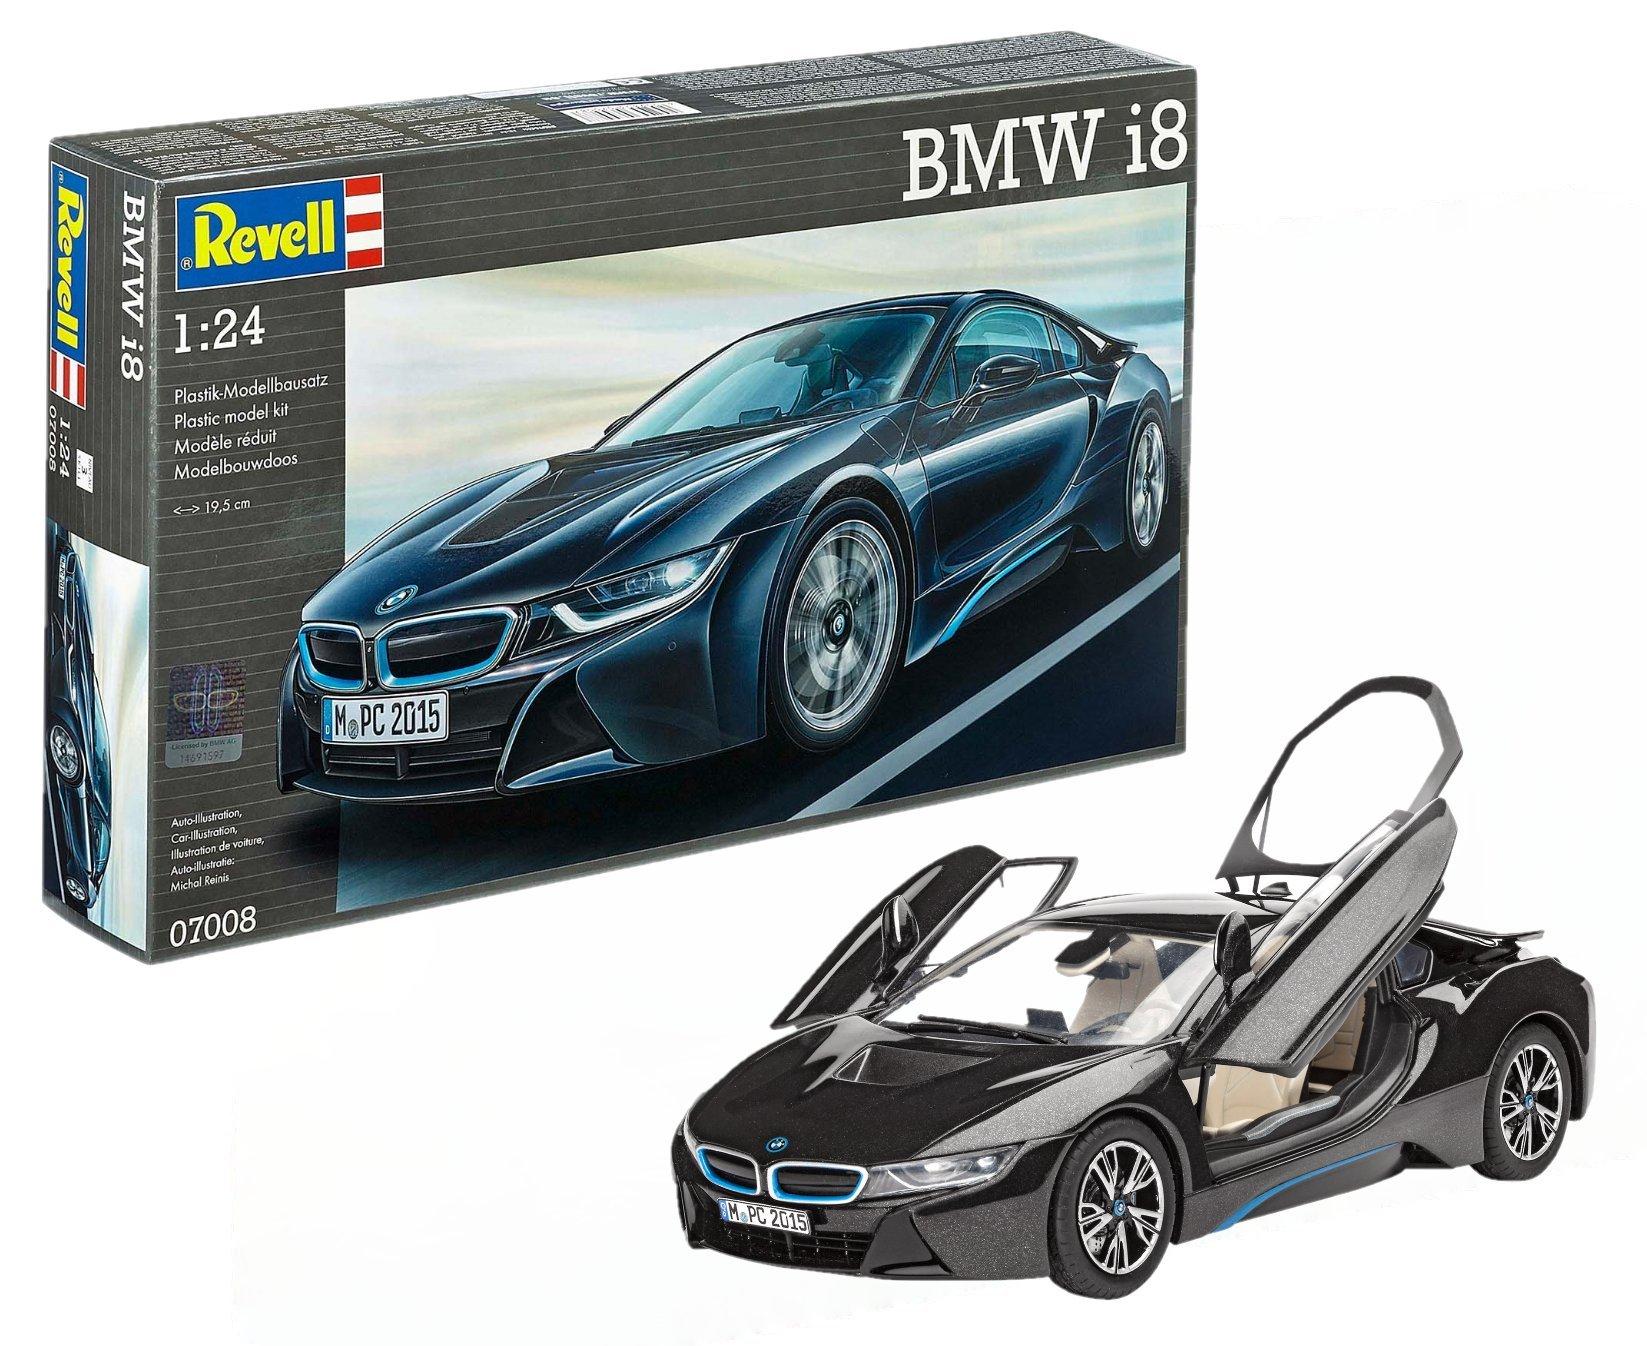 Scale Models BMW: Amazon.com on ezgo cart models, golf push carts, golf carts like trucks,